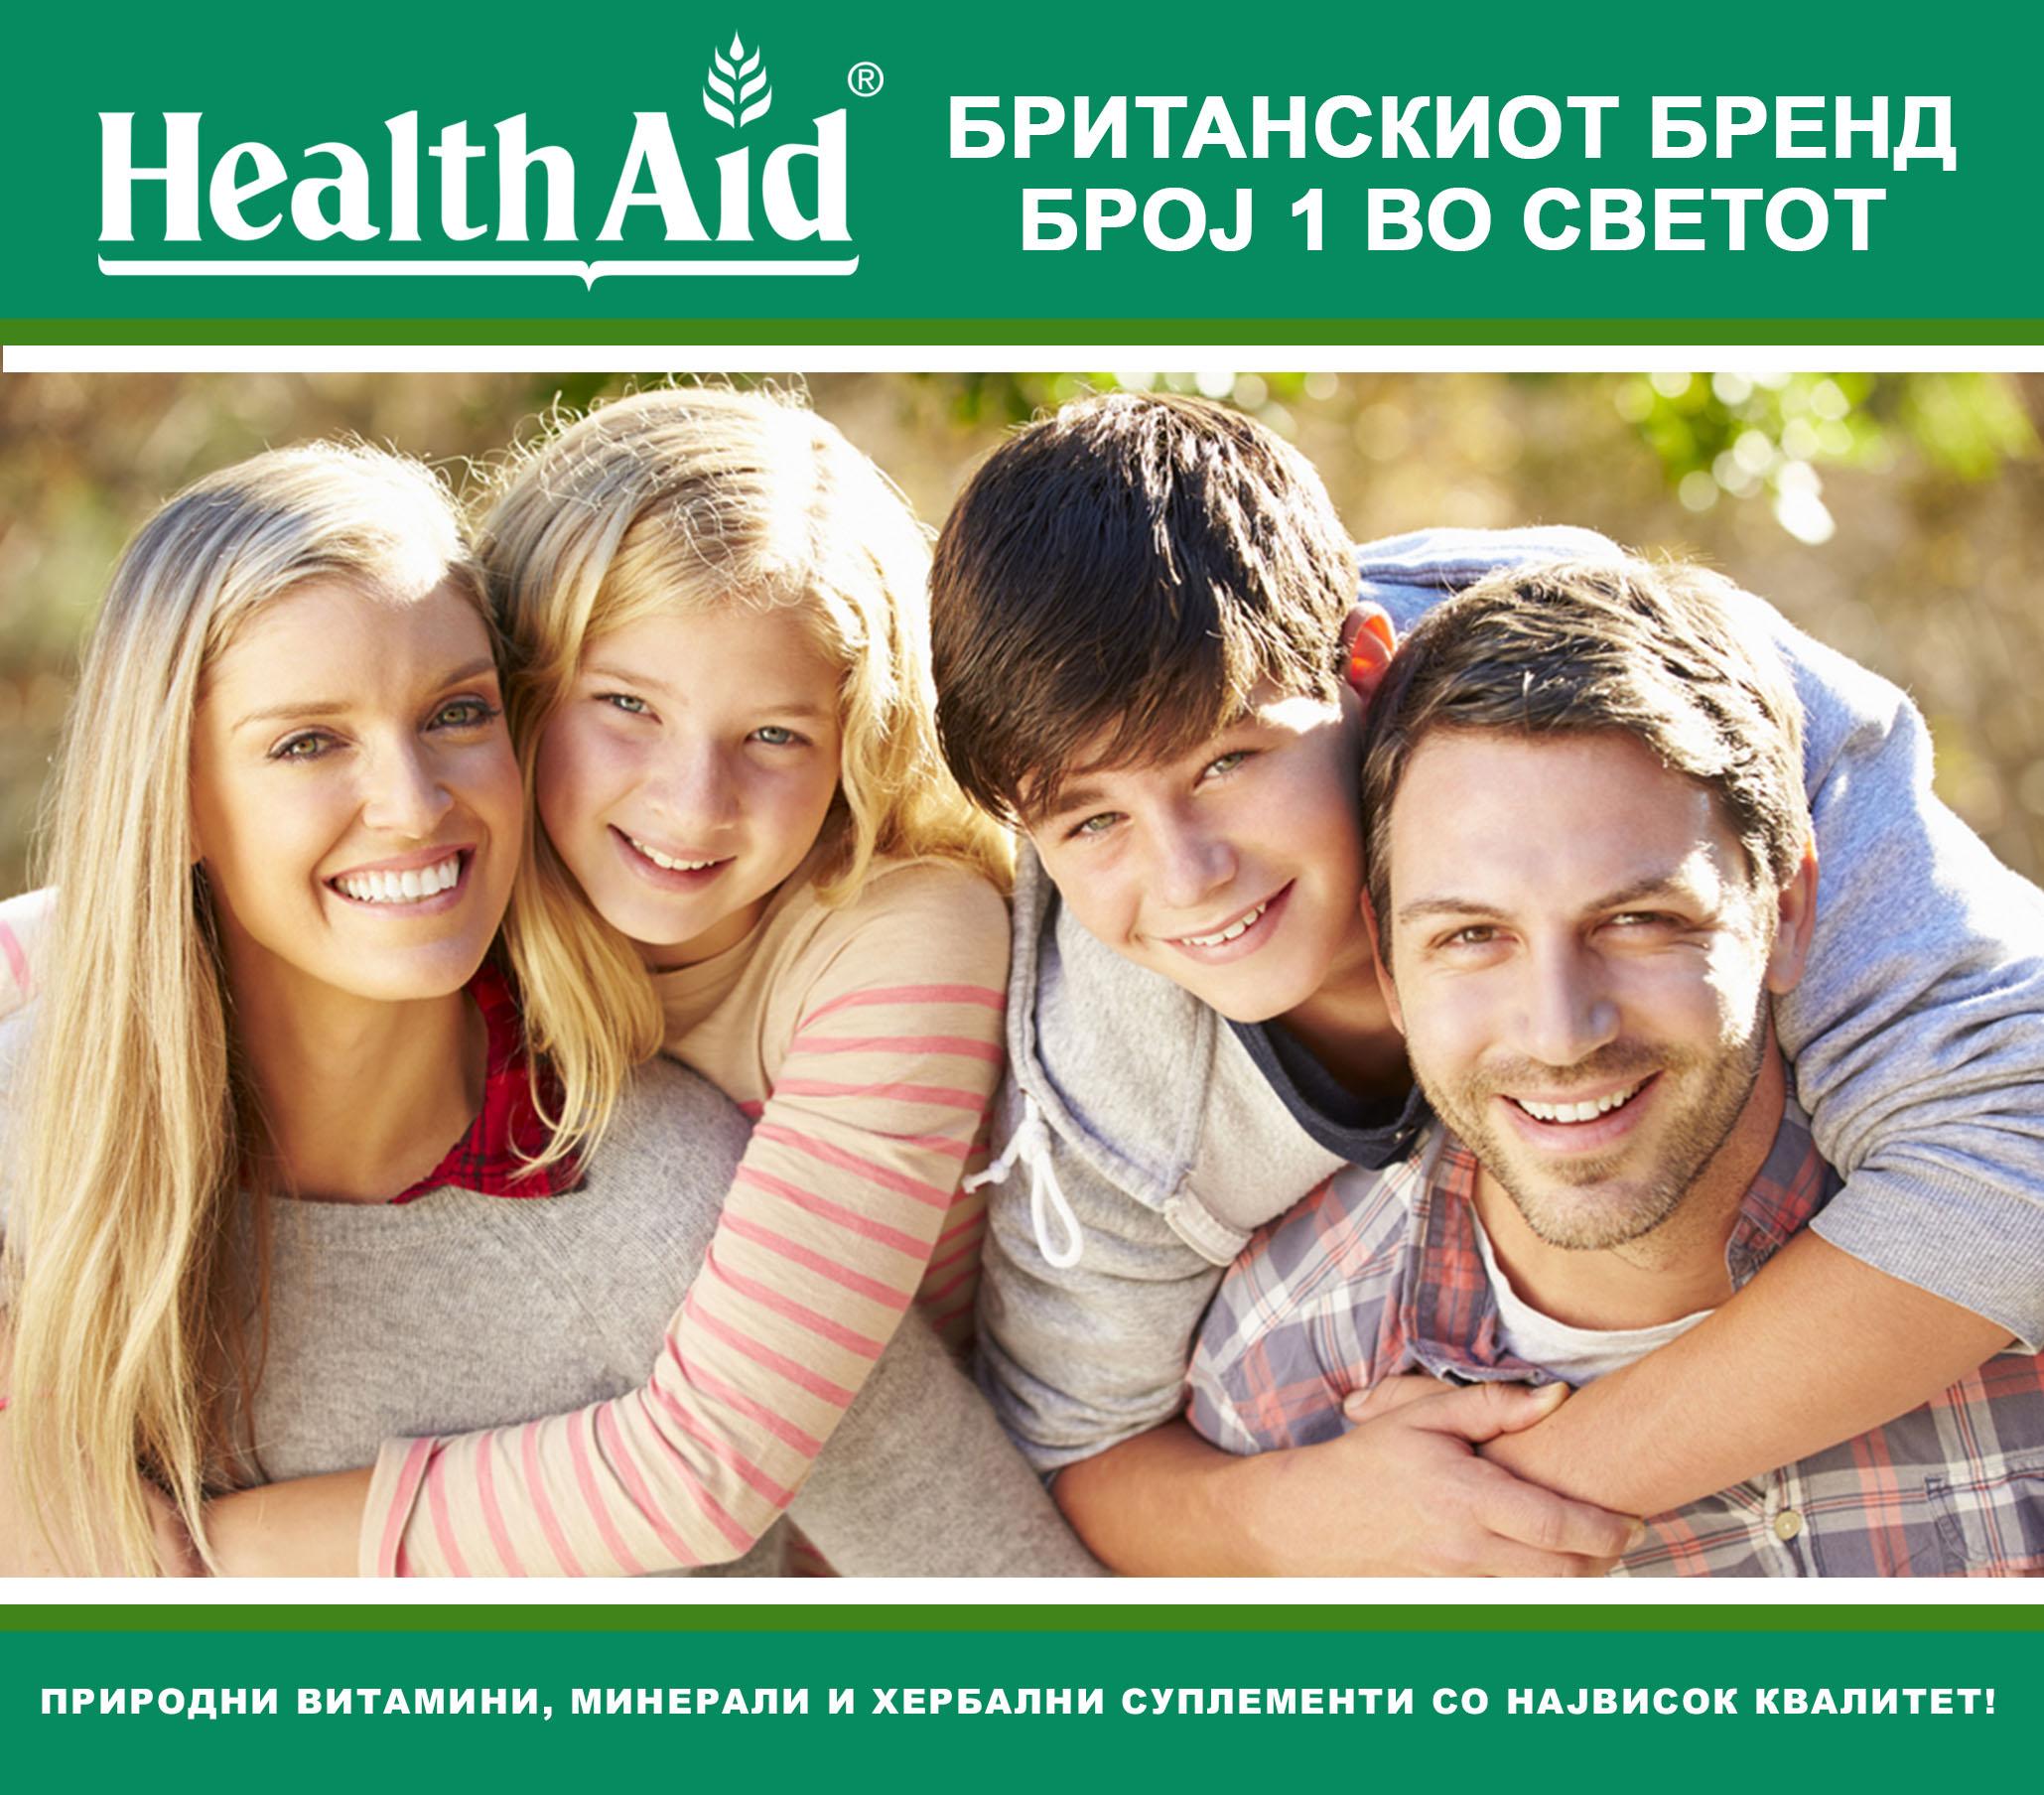 HealthAid Britanski Brend Broj 1 Vo Svetot